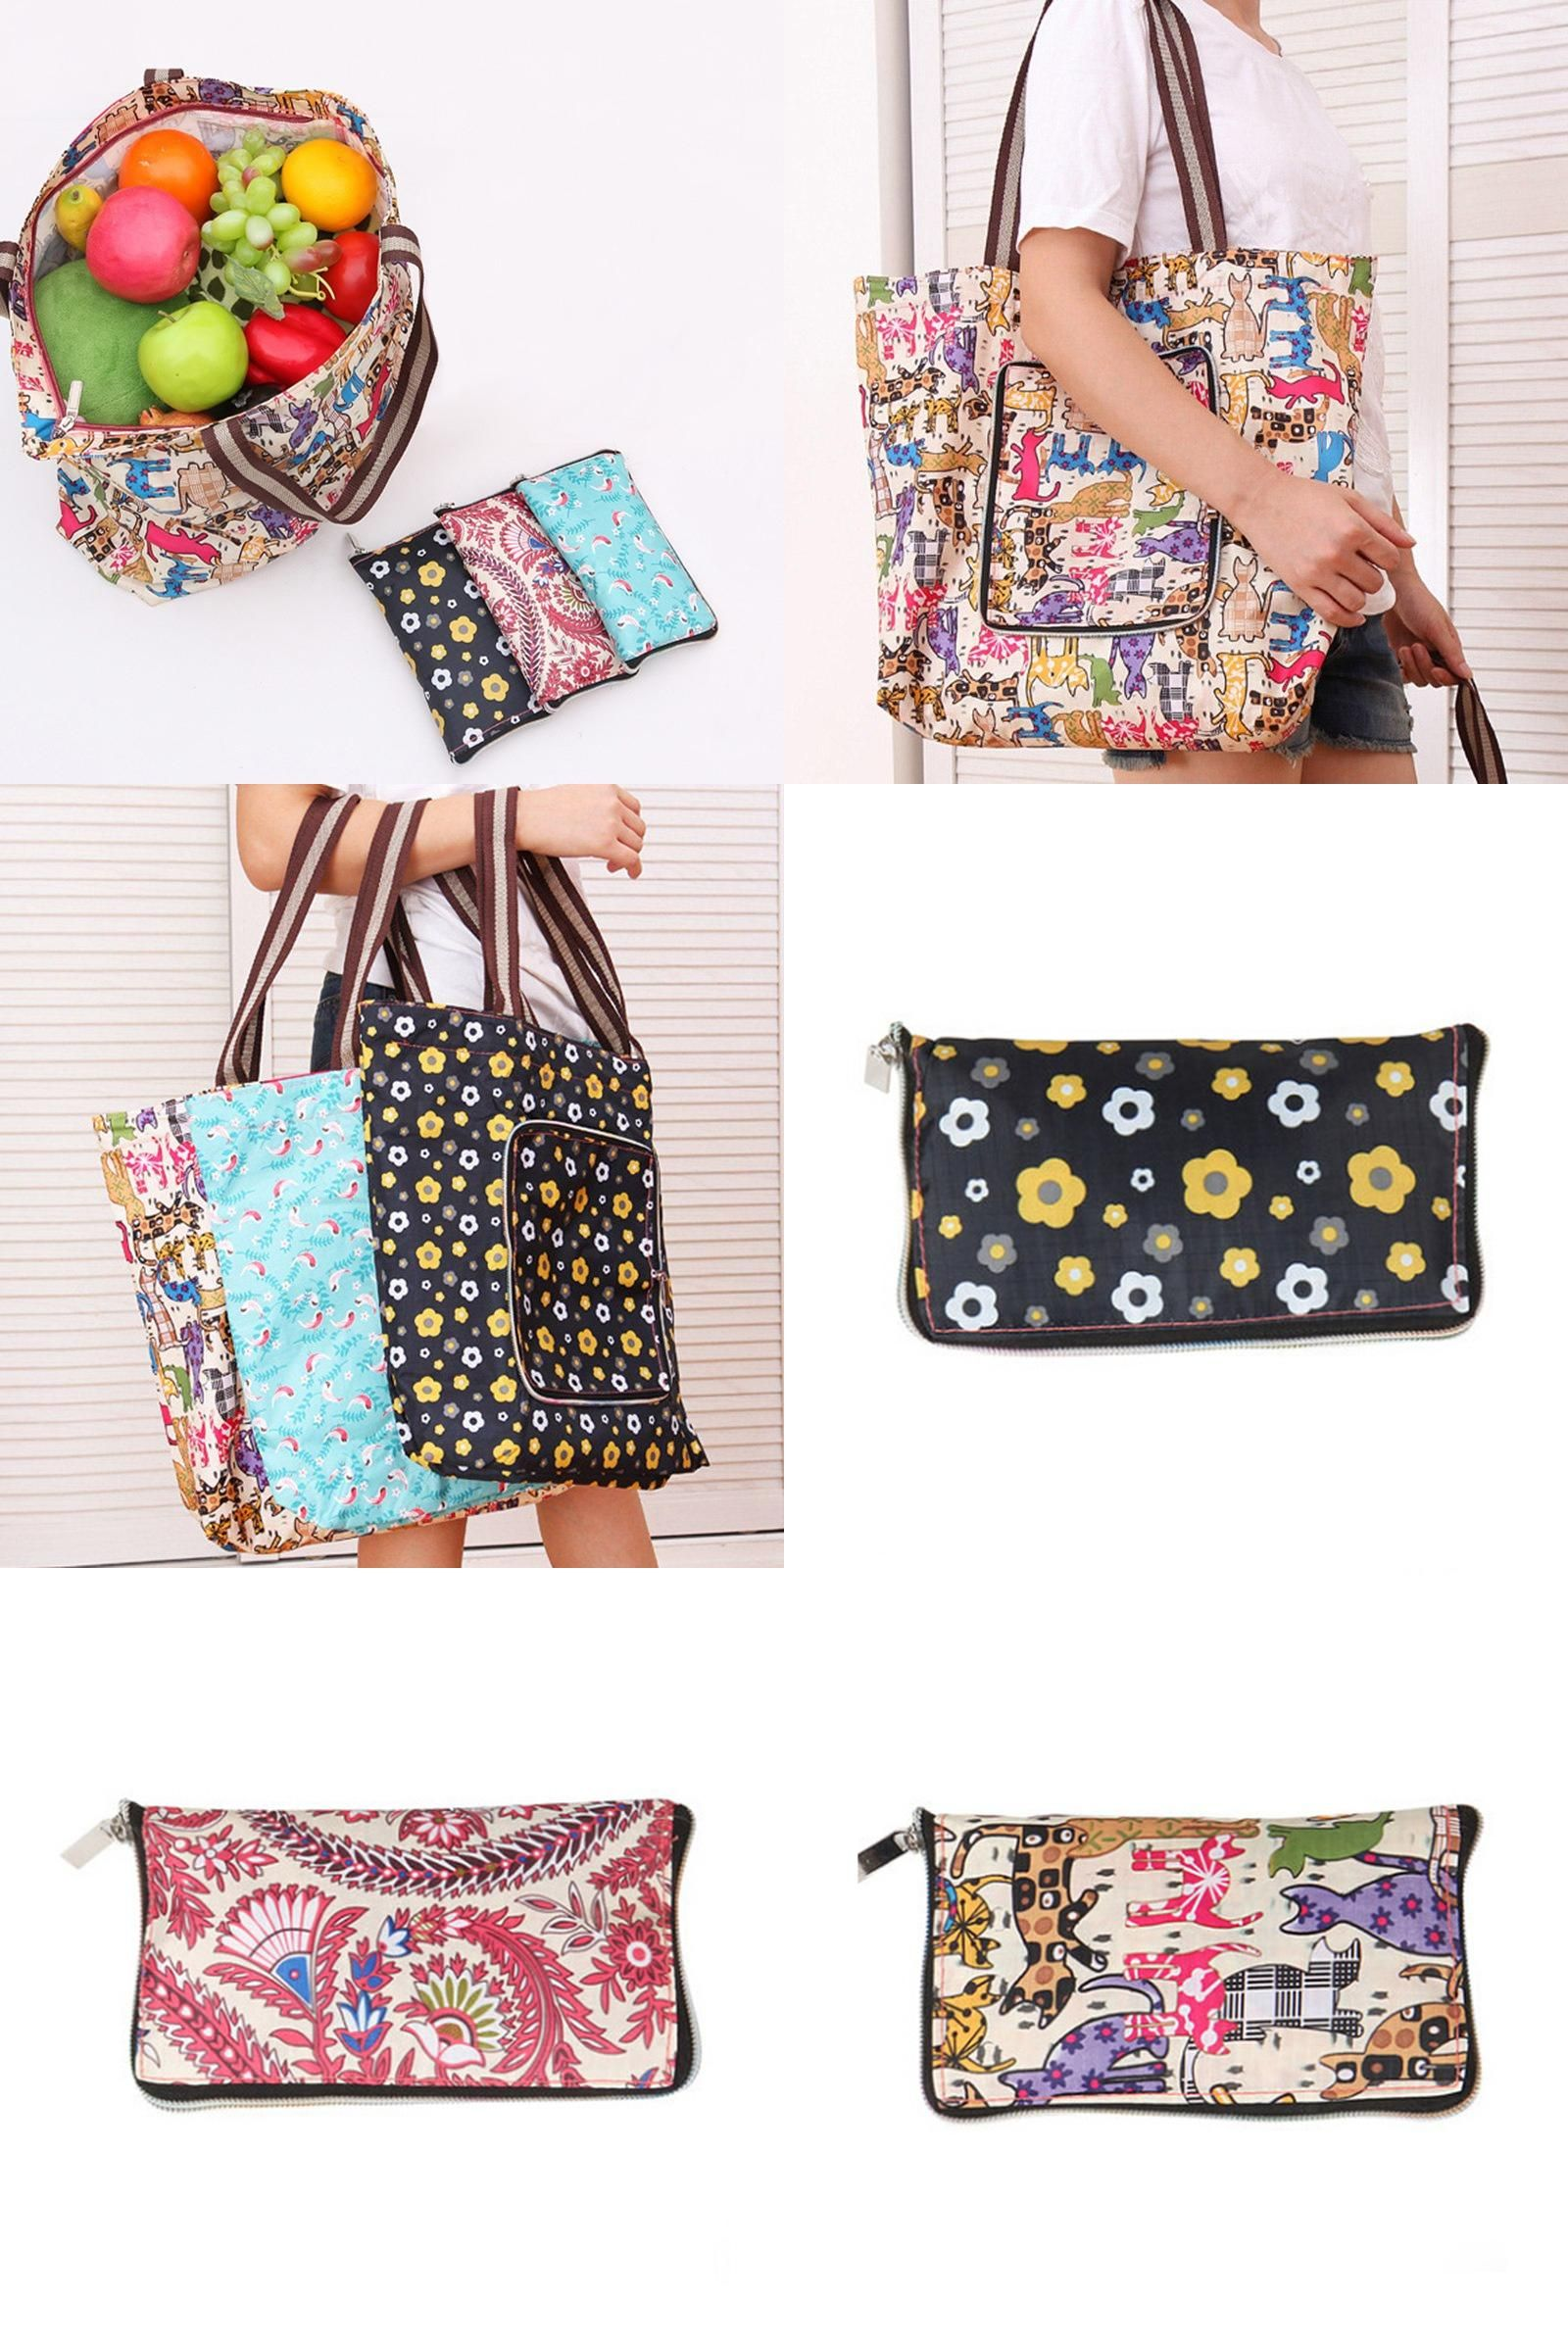 Visit to Buy  Women Handbags Large Capacity Foldable Shopping Bag Travel Tote  Reusable Shopping 12dfbf1429